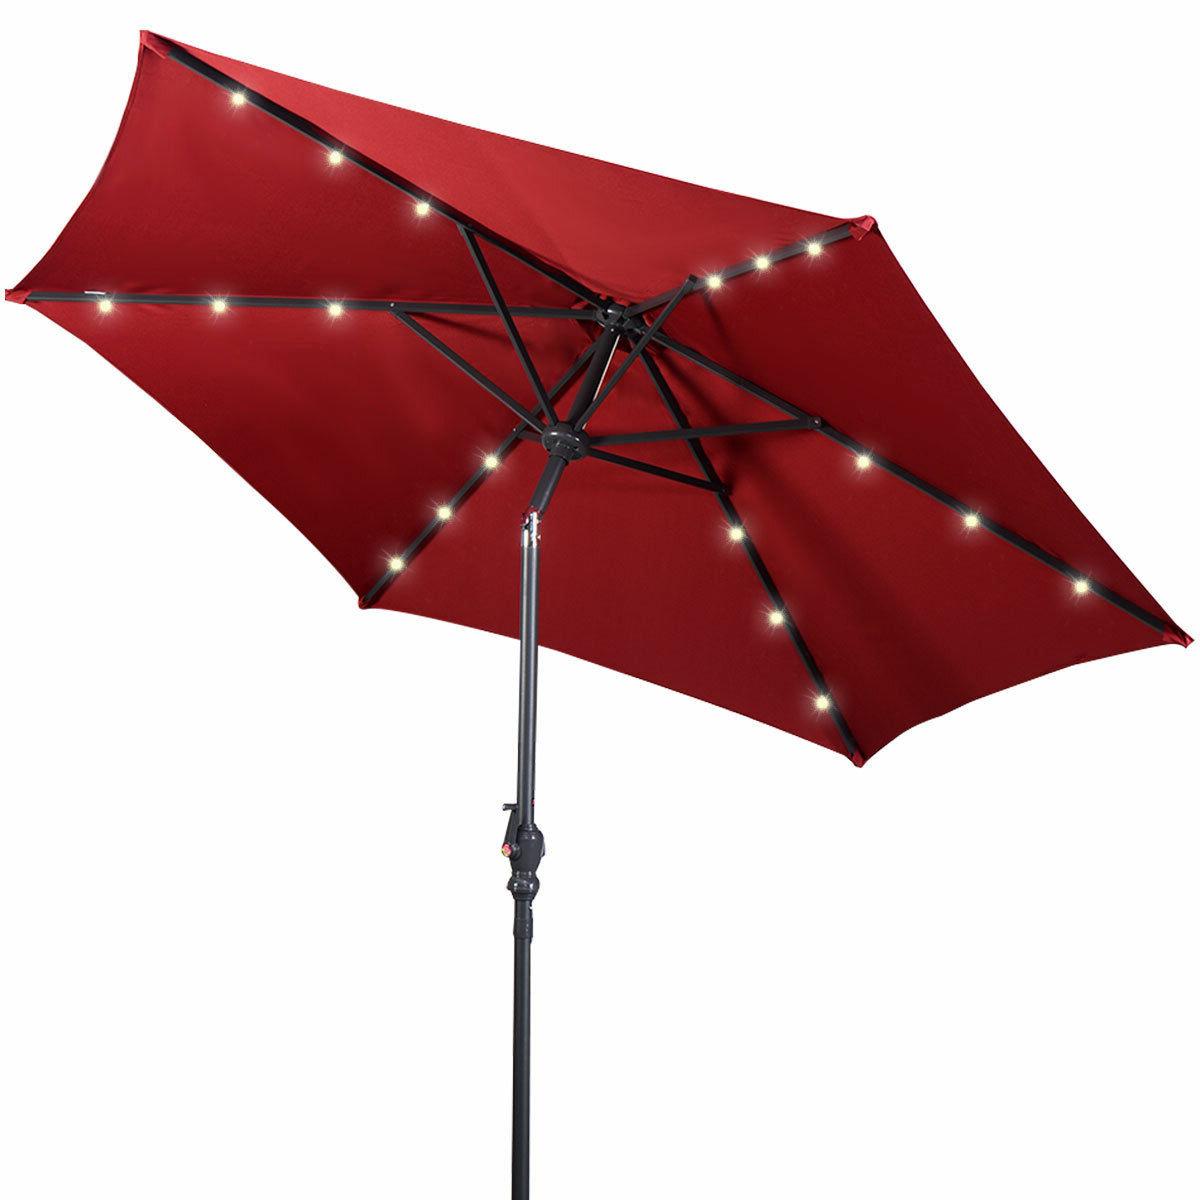 Herlinda Solar Lighted Market Umbrellas Inside Fashionable Eastwood 9' Market Umbrella (Gallery 18 of 20)